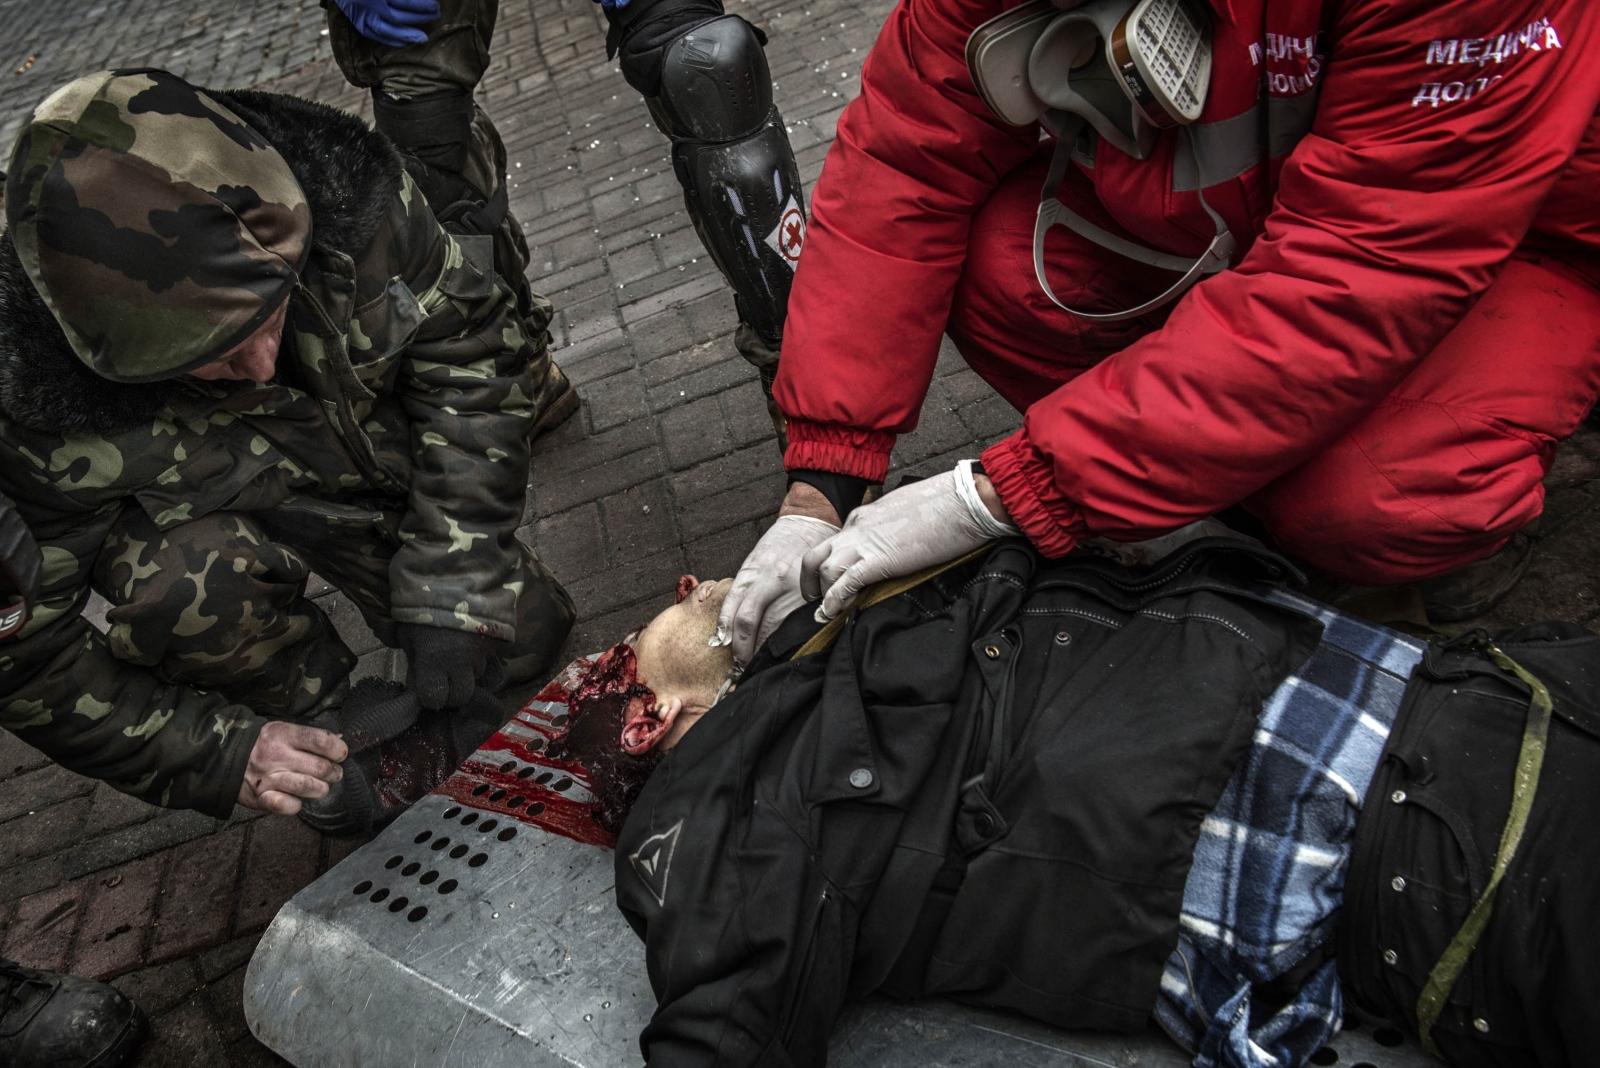 Art and Documentary Photography - Loading Behind_Kiev_s_barricades_058.jpg